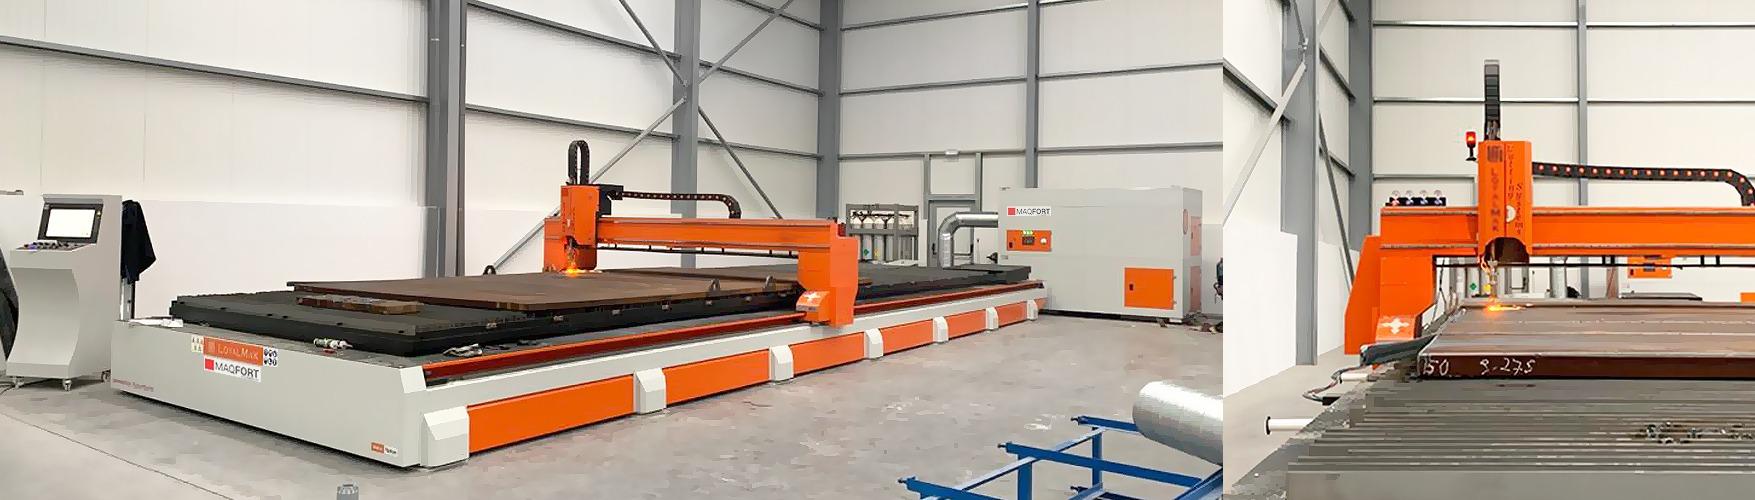 Máquina de corte plasma de chapa CNC – 12 metros x 3 metros